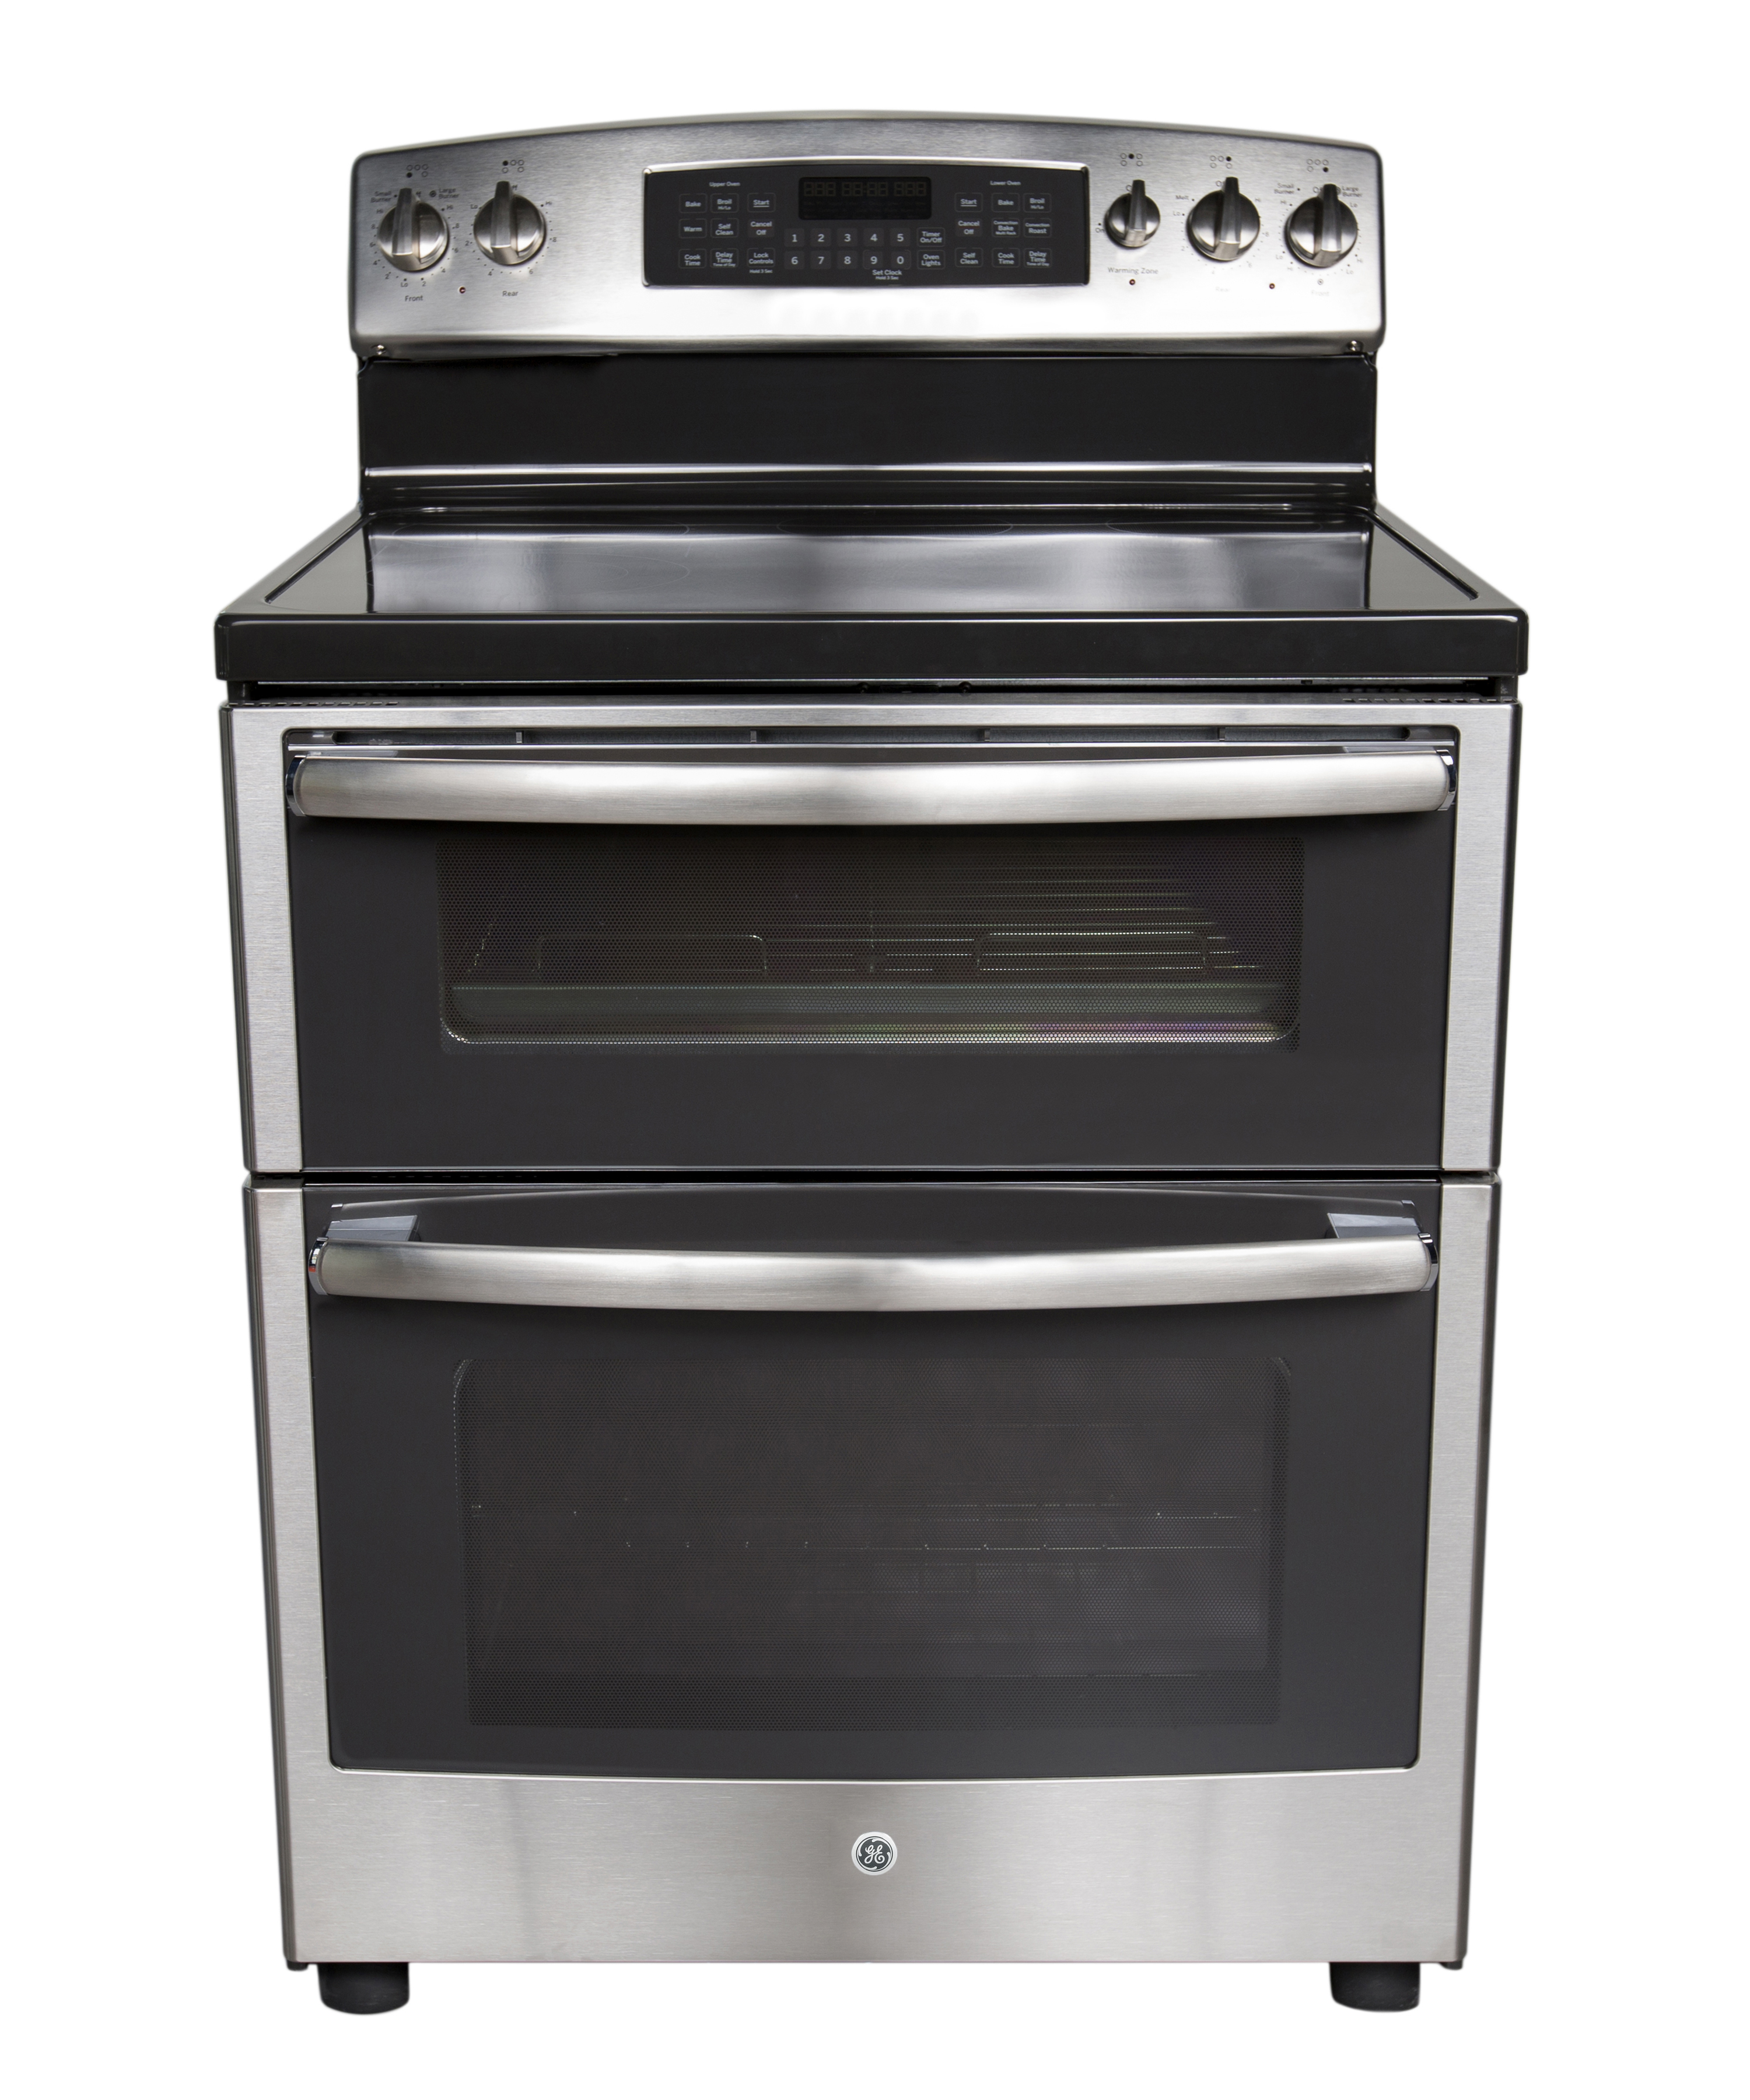 Uncategorized Kitchen Appliances Reviews open sesame ges latest oven door works like a drawer ge easy load drawer